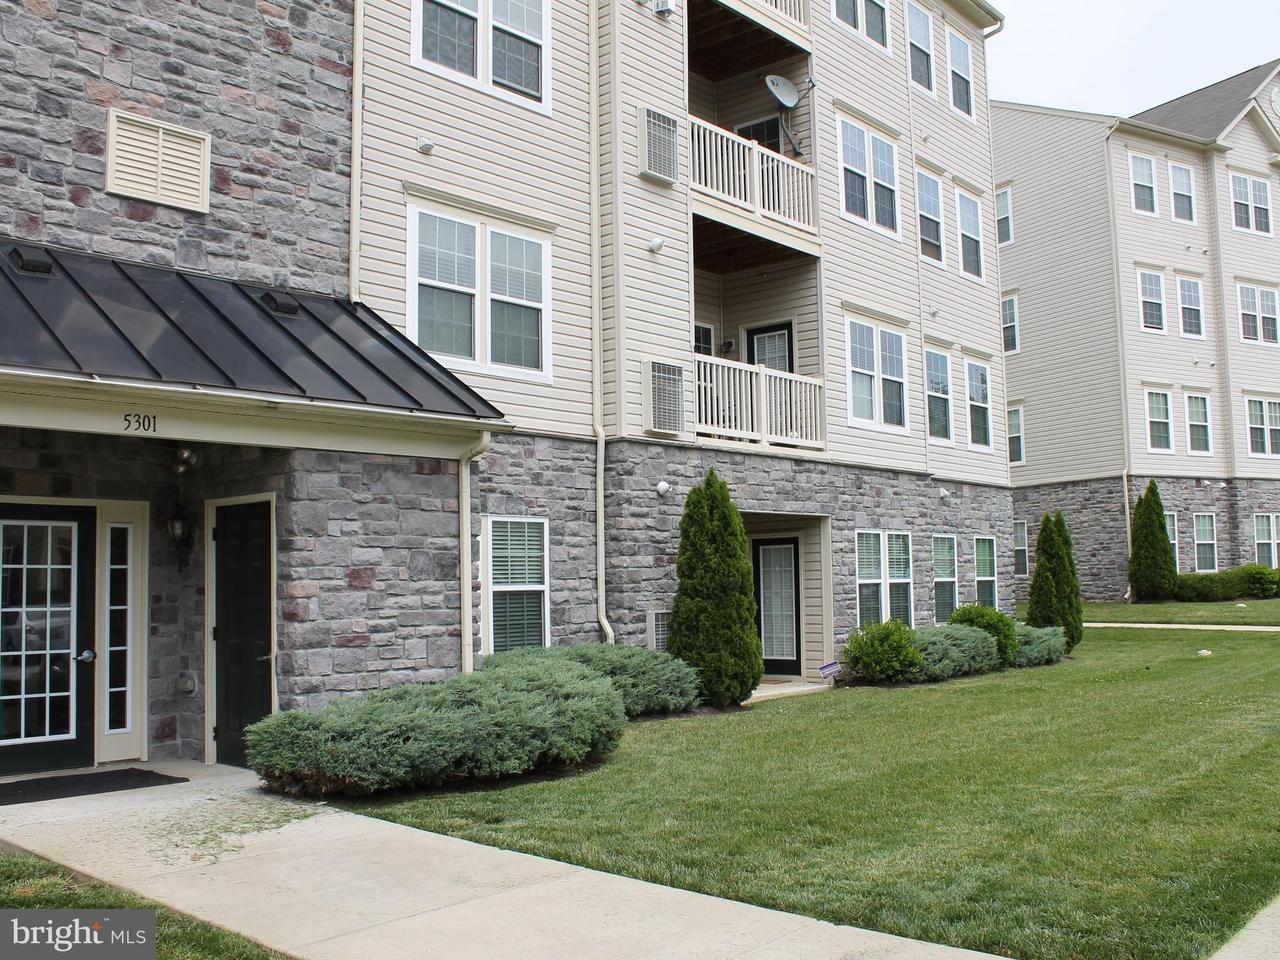 Condominium for Sale at 5301 Wyndholme Cir #204 Baltimore, Maryland 21229 United States